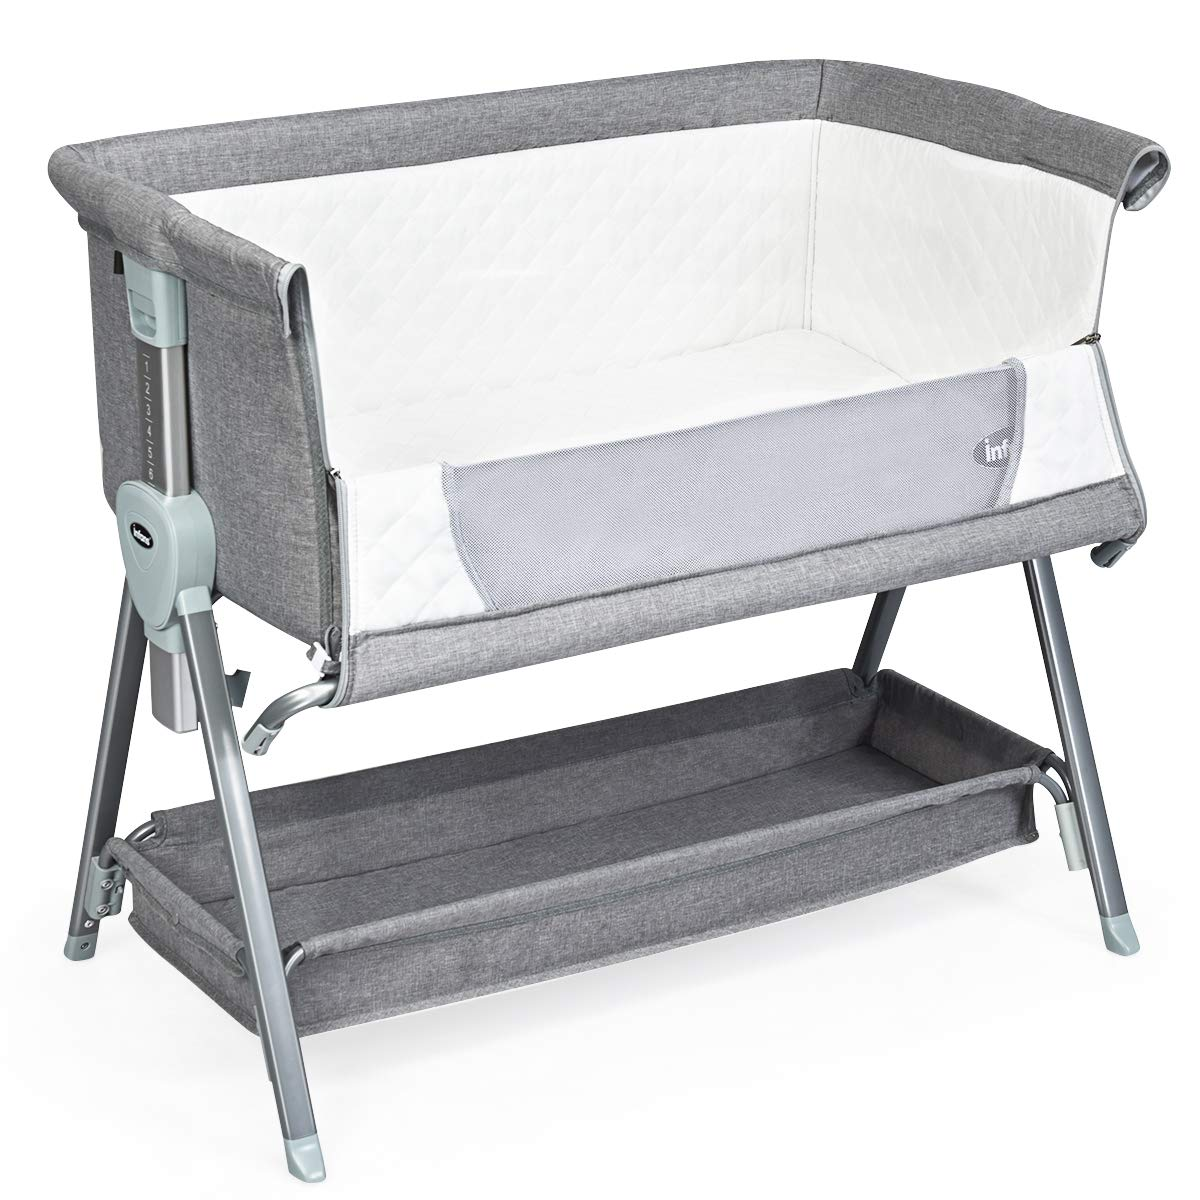 INFANS Baby Bedside Crib, Newborn Sleeper w Large Storage Basket, Adjustable Height Angle, Detachable Washable Mattress, Breathable Mesh, Straps, Easy Moving Bed Side Bassinet for Infant, Grey